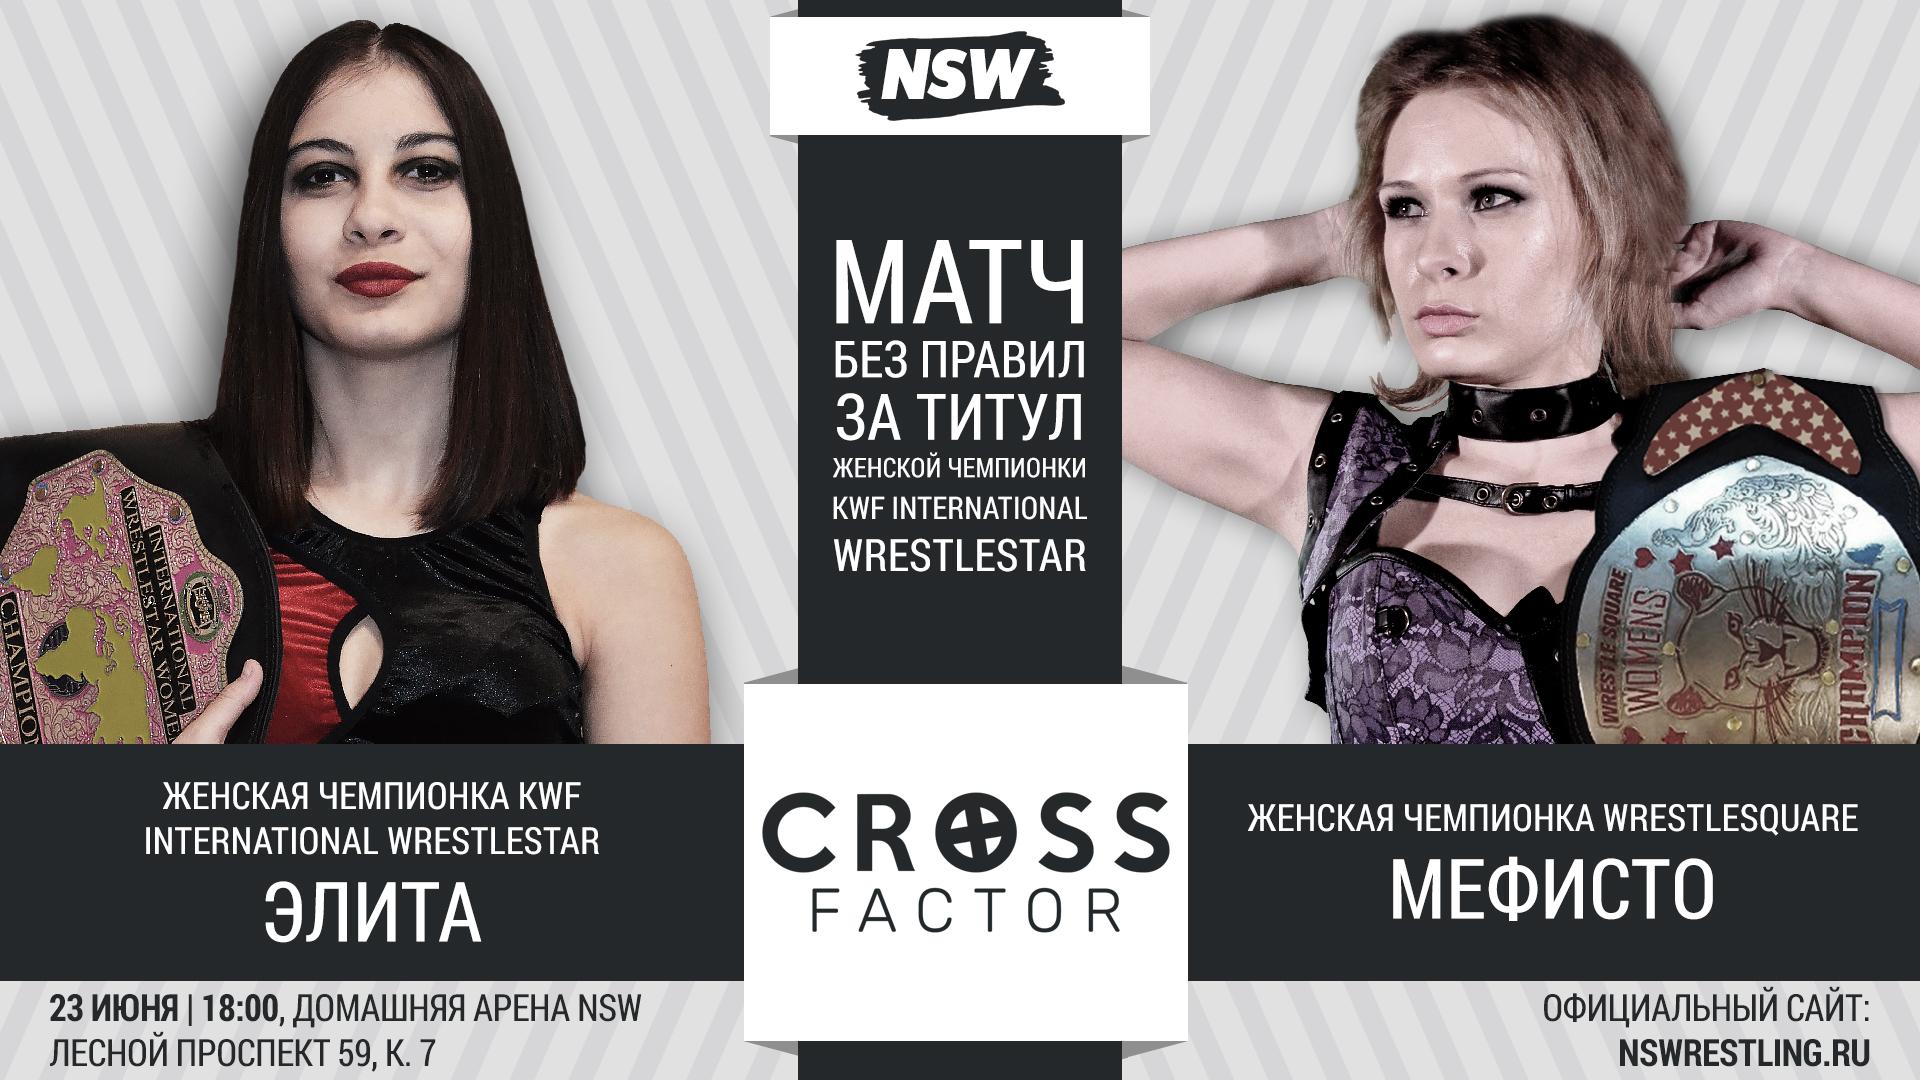 NSW Cross Factor (23/06): Элита против Мефисто